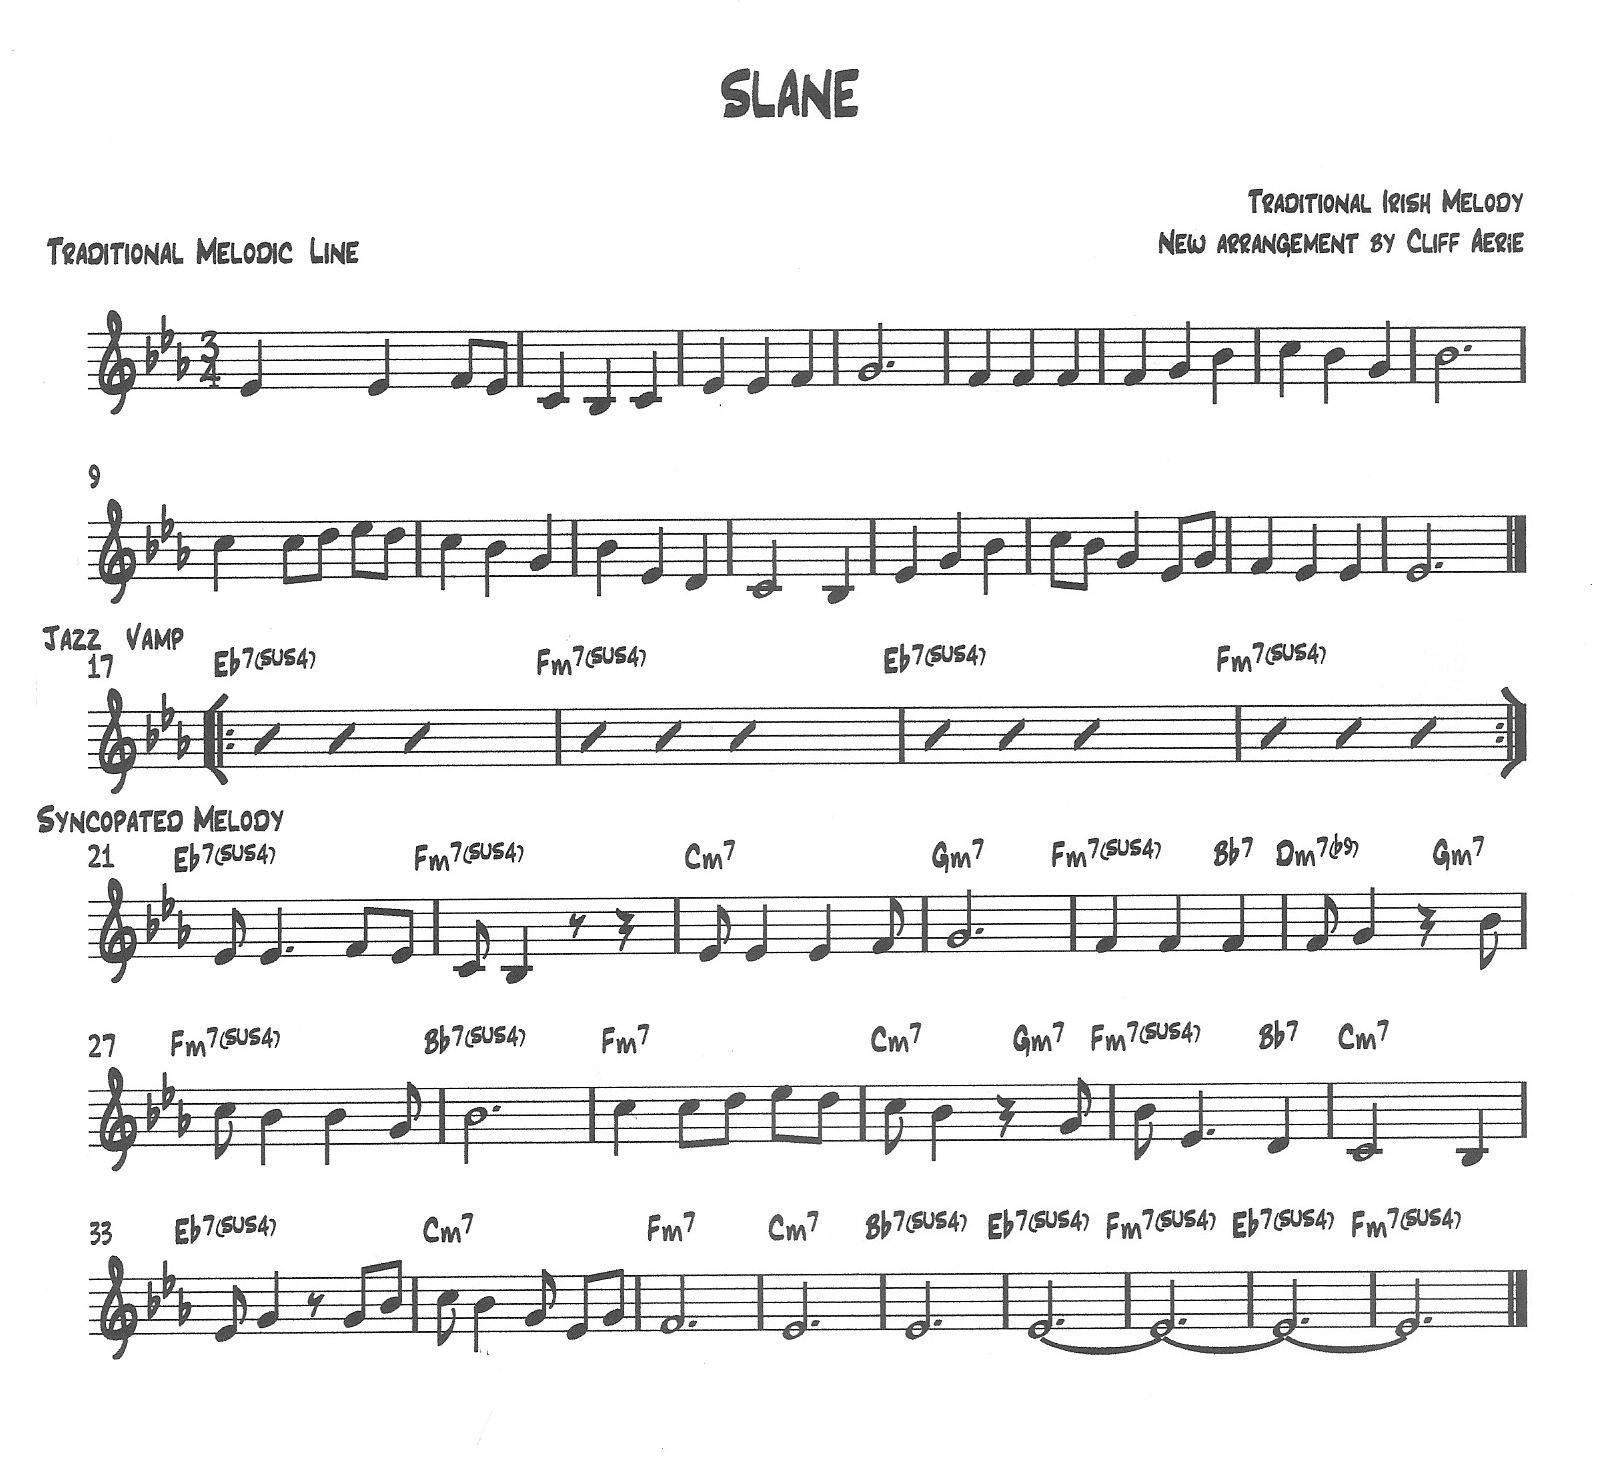 Old Rugged Cross Saxophone: Jazz Hymn Arranging